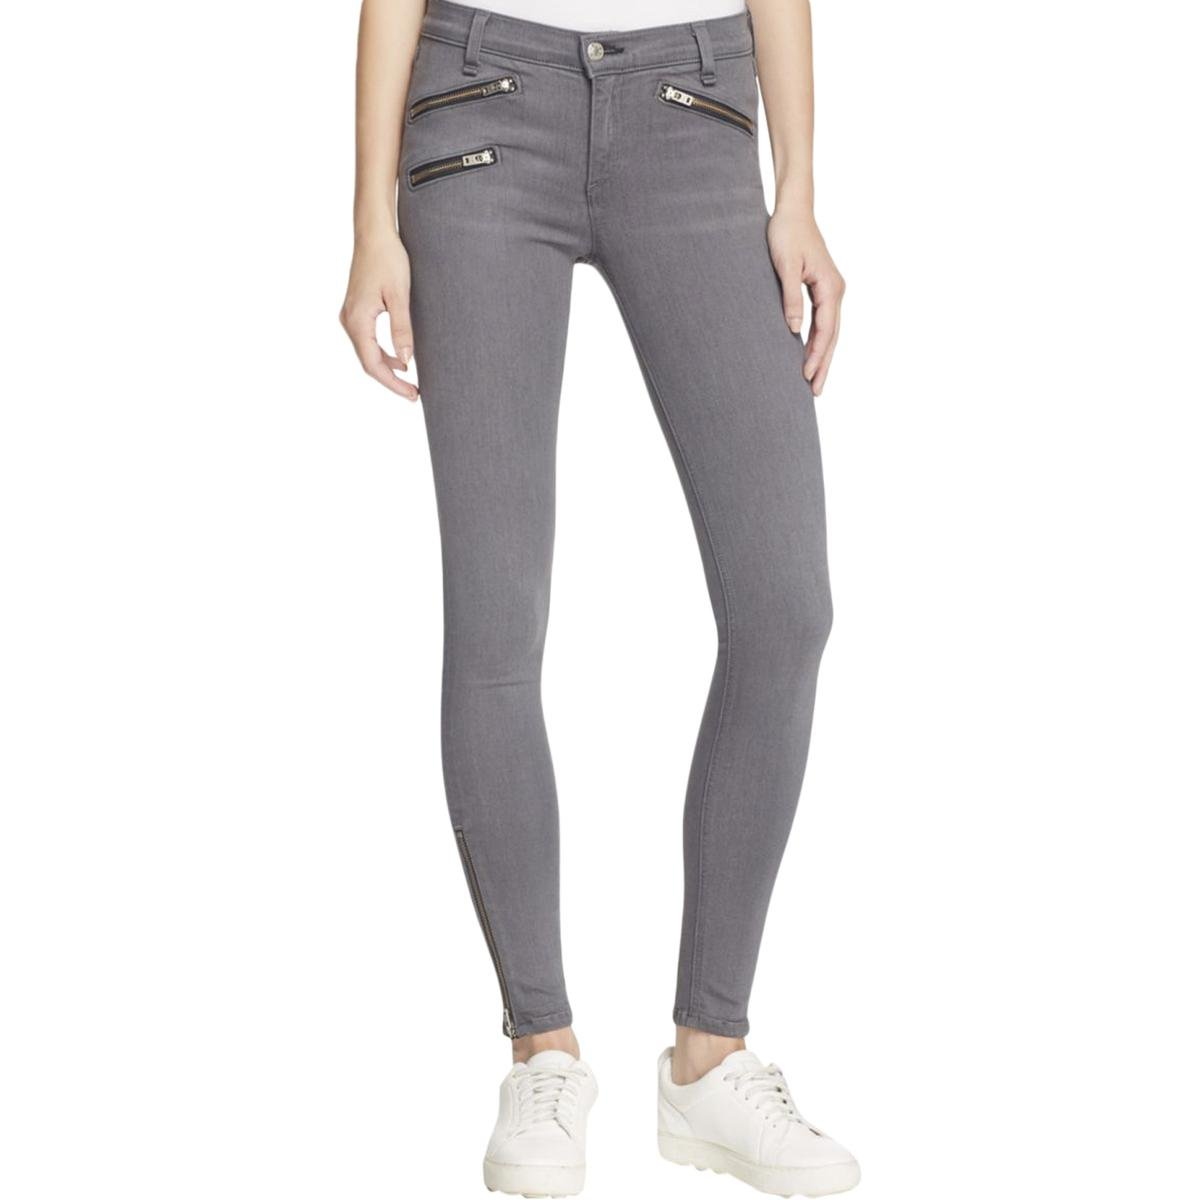 Rag & Bone Womens Zipper Pocket Zipper Flare Pants Gray 26